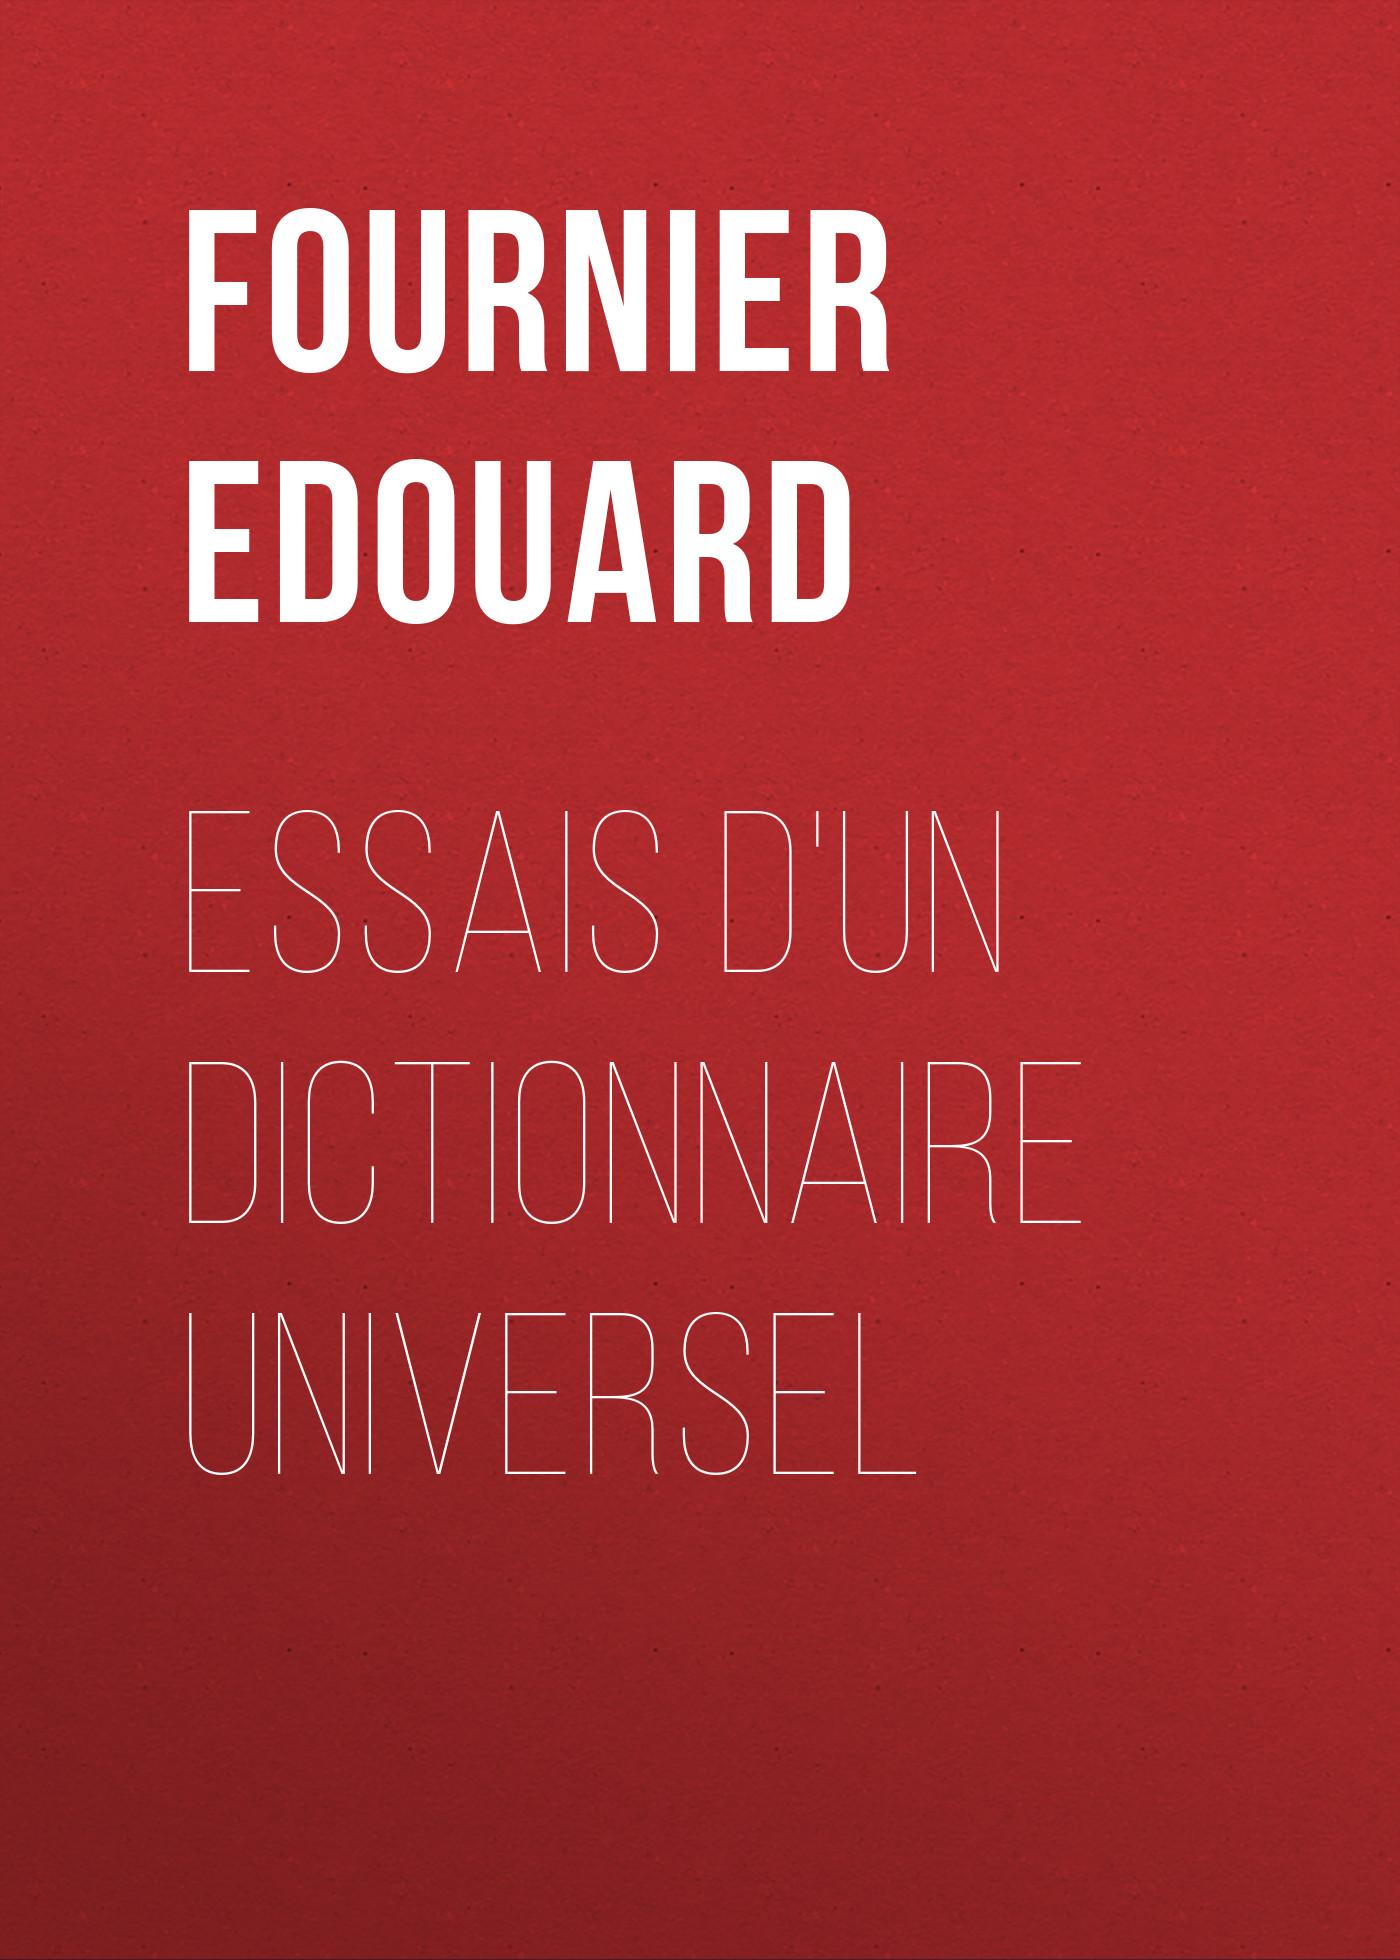 Fournier Edouard Essais d'un dictionnaire universel карты для покера fournier wpt gold 100